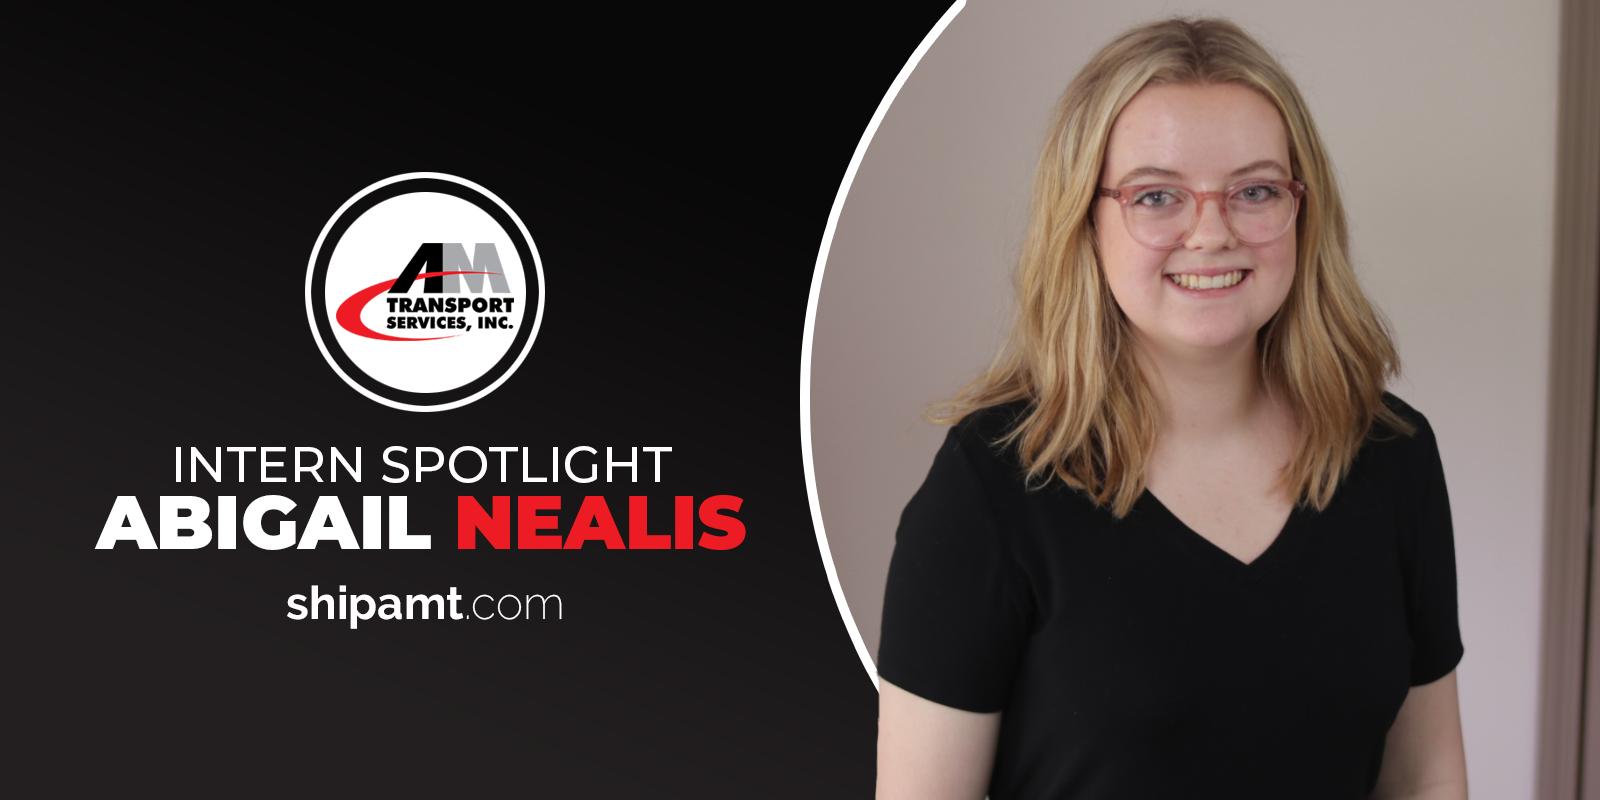 Intern Spotlight: Abigail Nealis